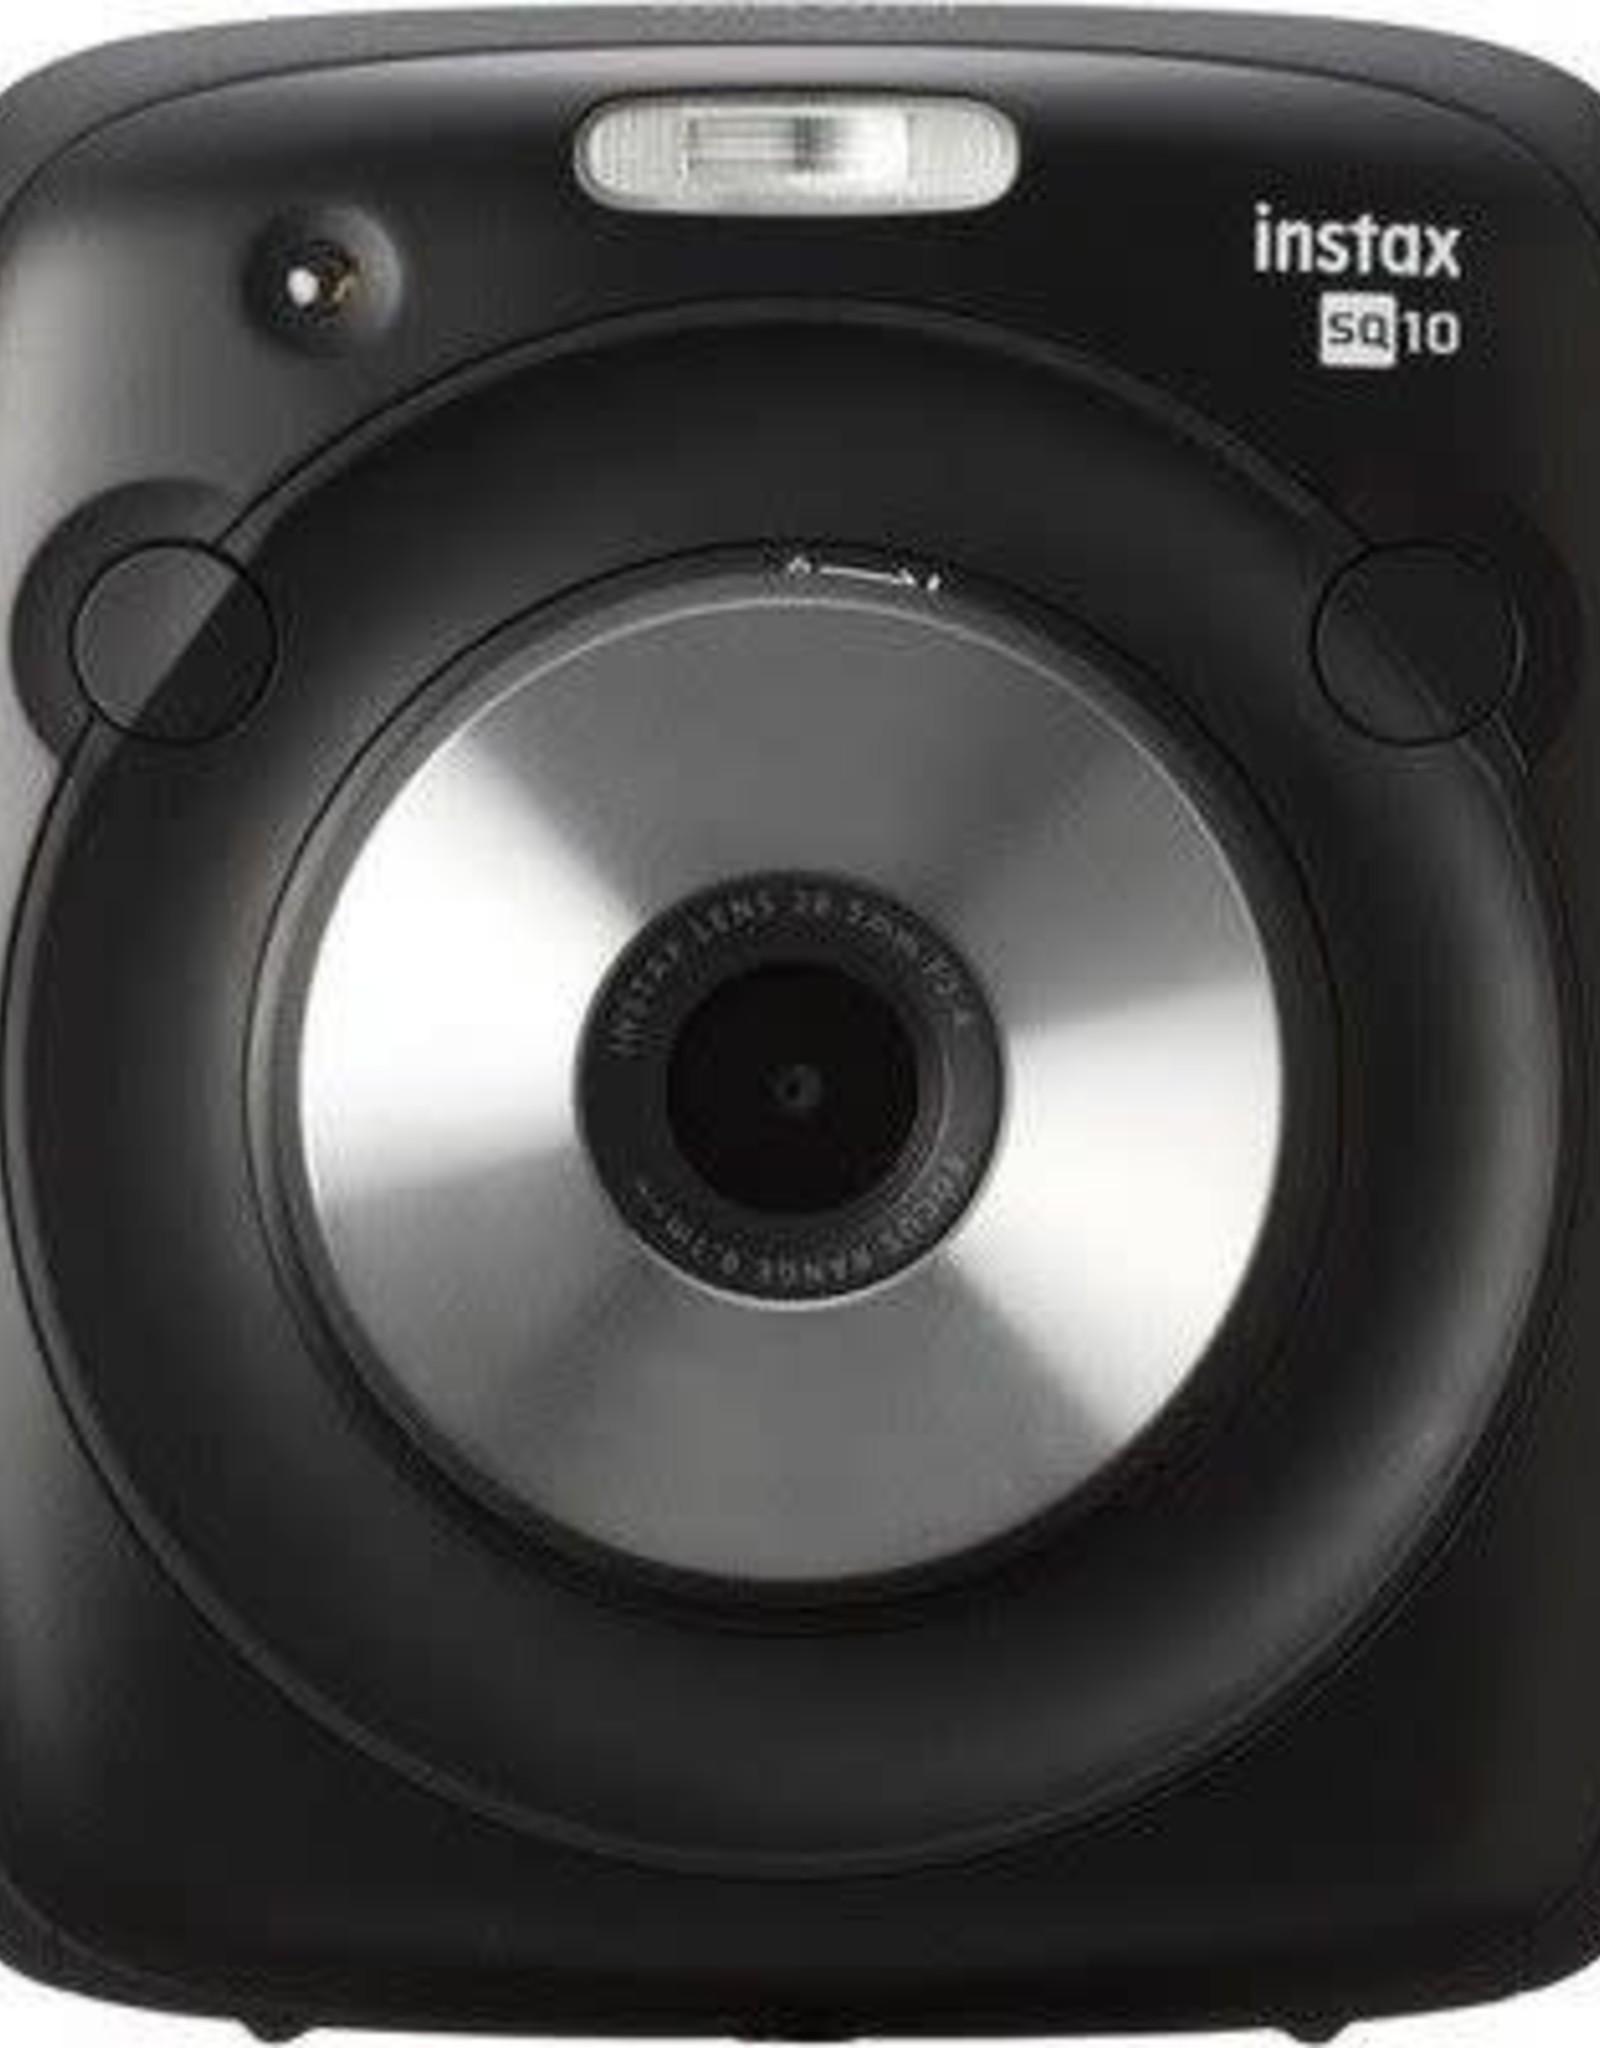 Instax Fujifilm | Instax SQUARE SQ20 Hybrid Instant Camera - Matte Black